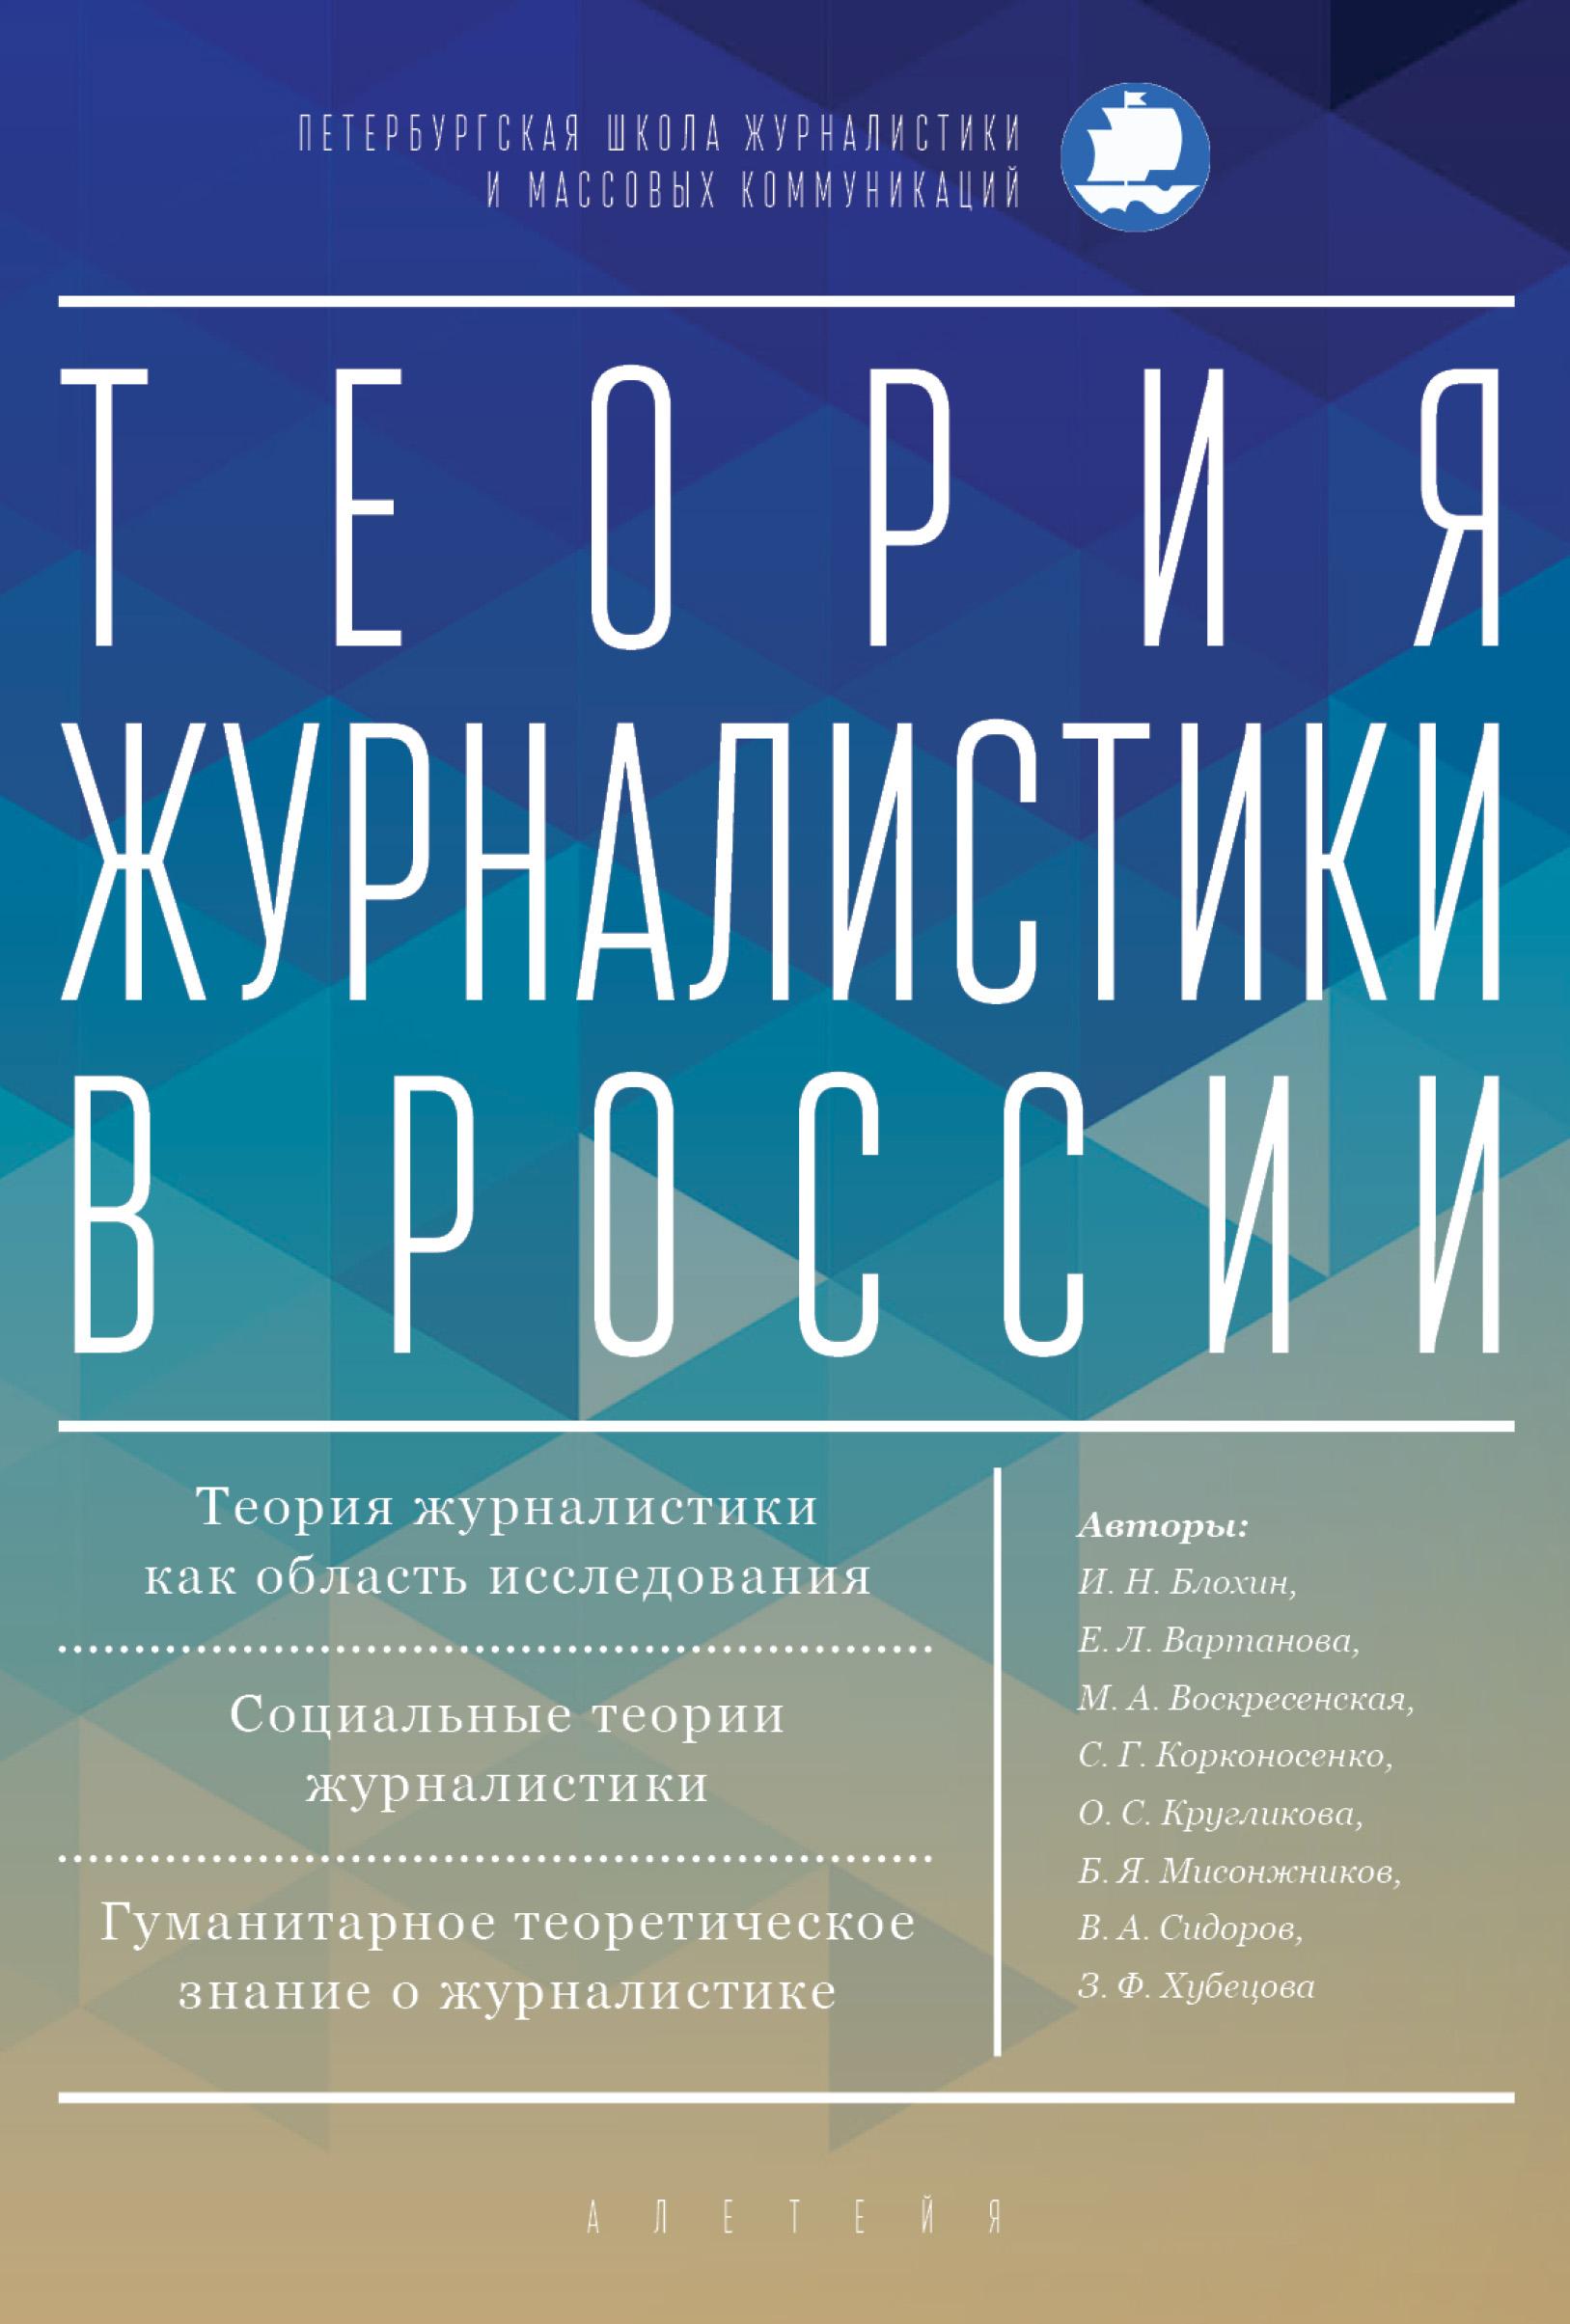 Коллектив авторов Теория журналистики в России коллектив авторов теория журналистики в россии